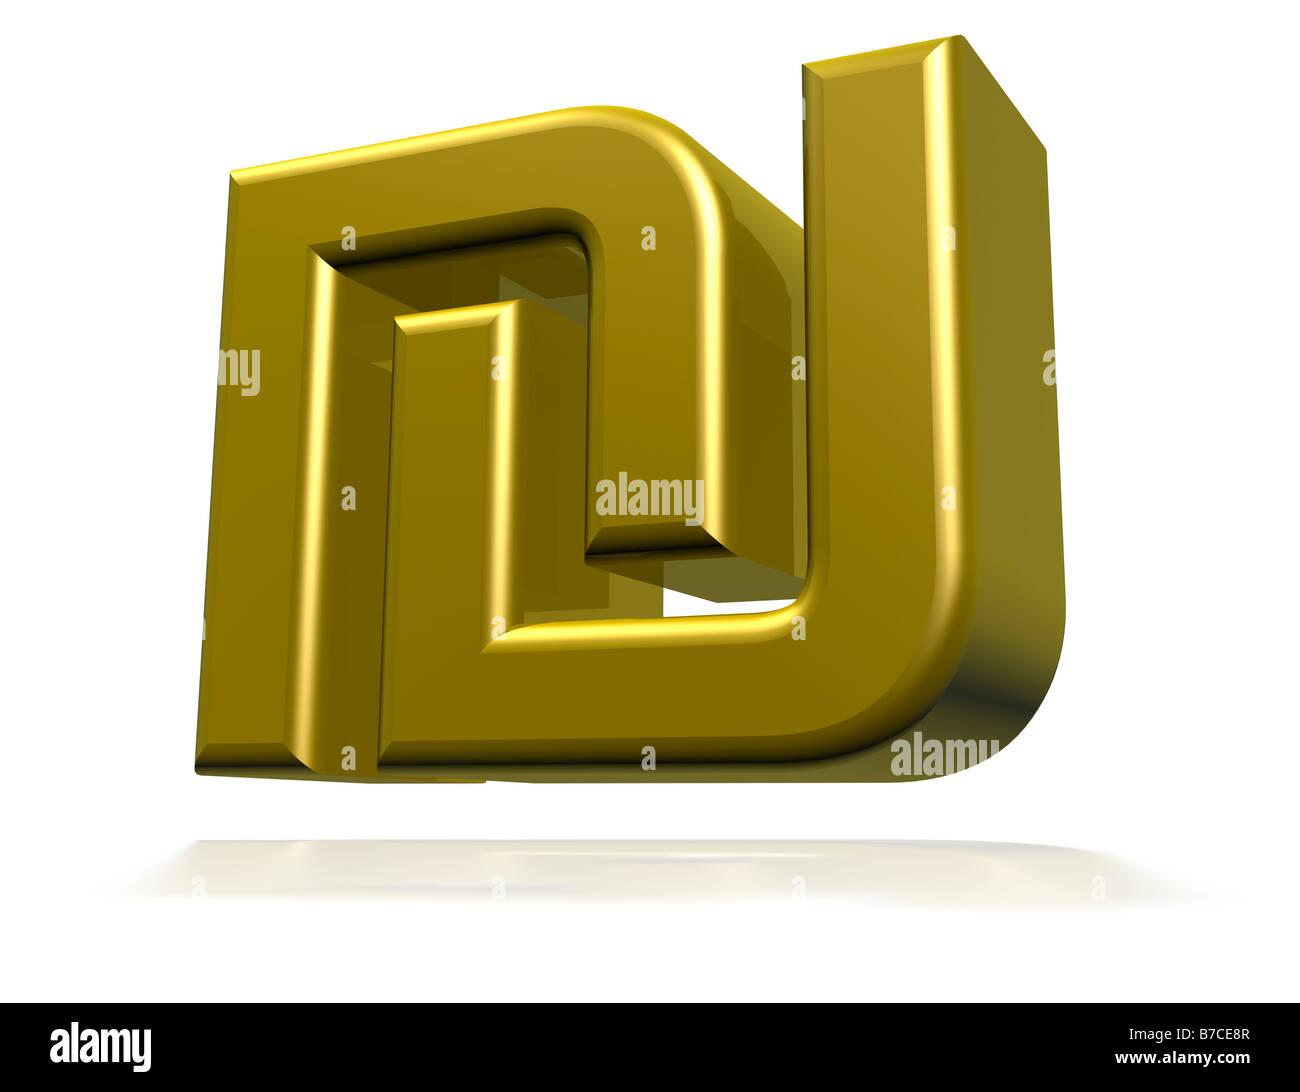 Israeli New Shekel Symbol 3d Cgi Render Stock Photo 21787607 Alamy